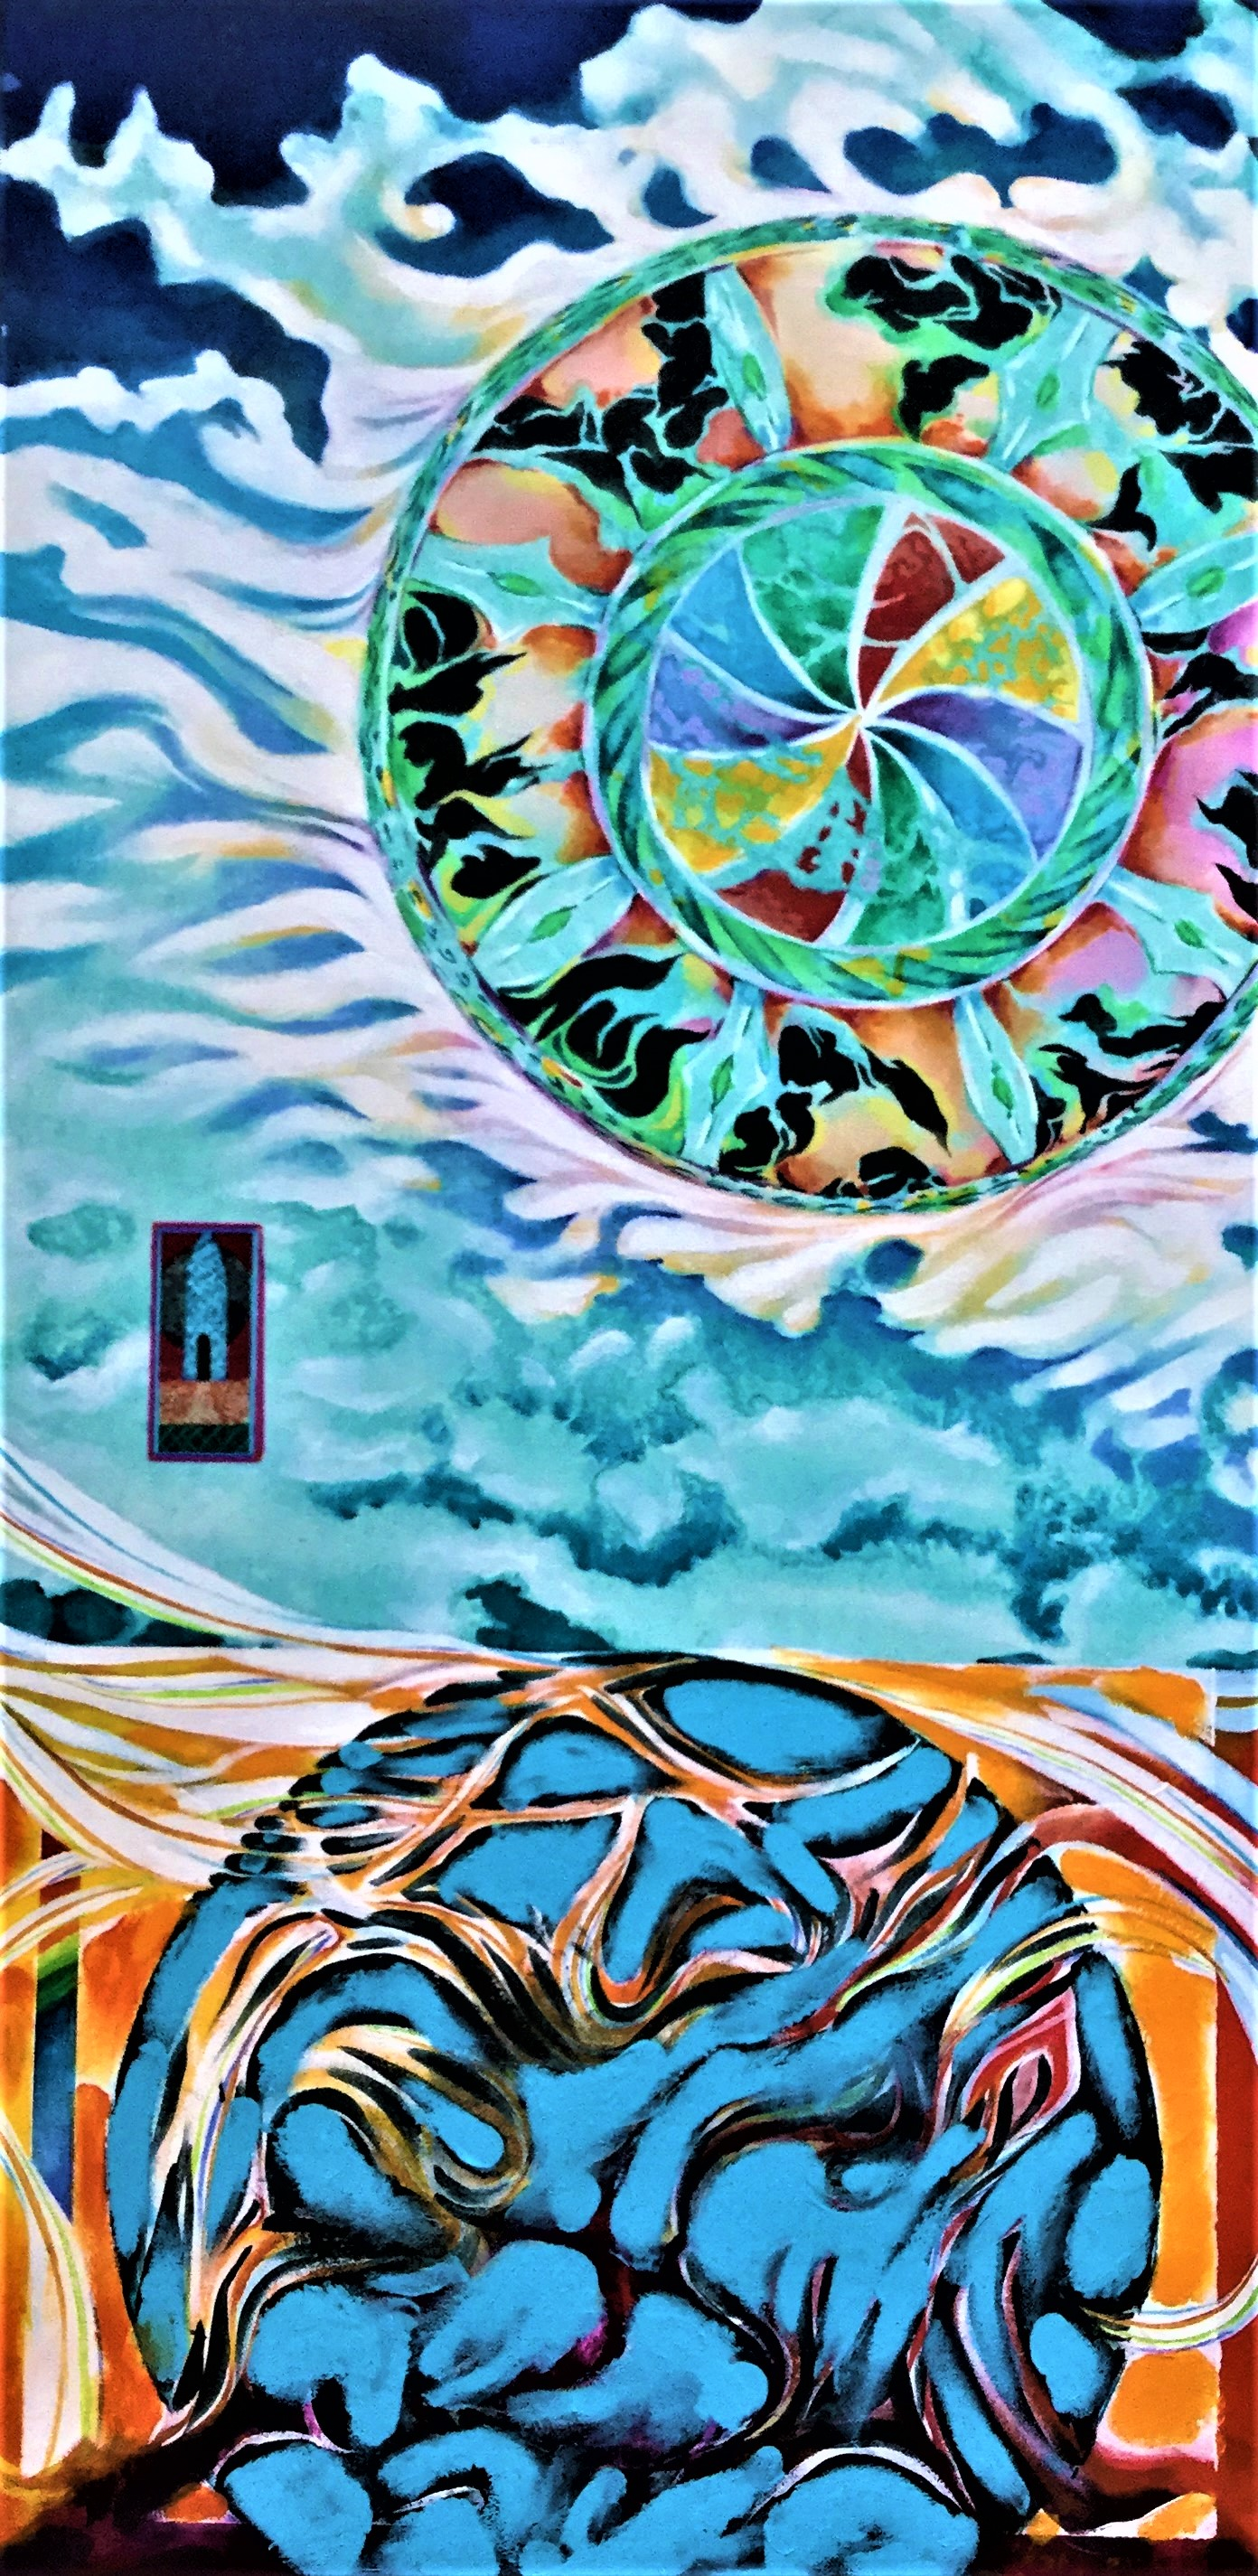 Dalai-acrylic-on-canvas-18-in-x-36-in